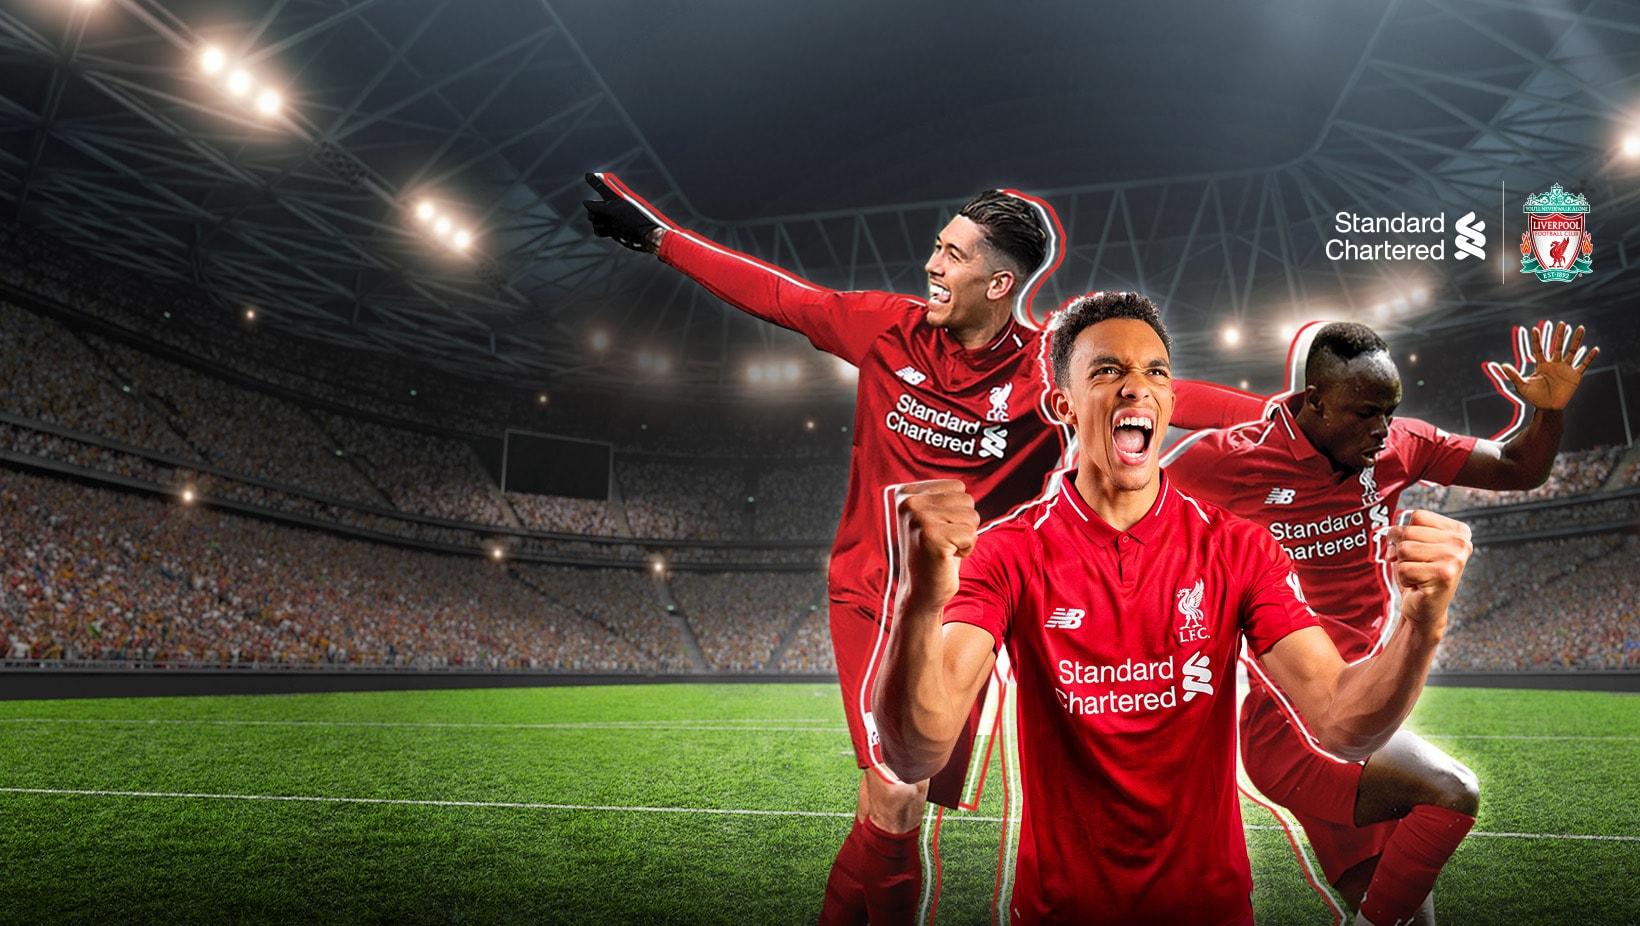 Liverpool Football Club 2019 final